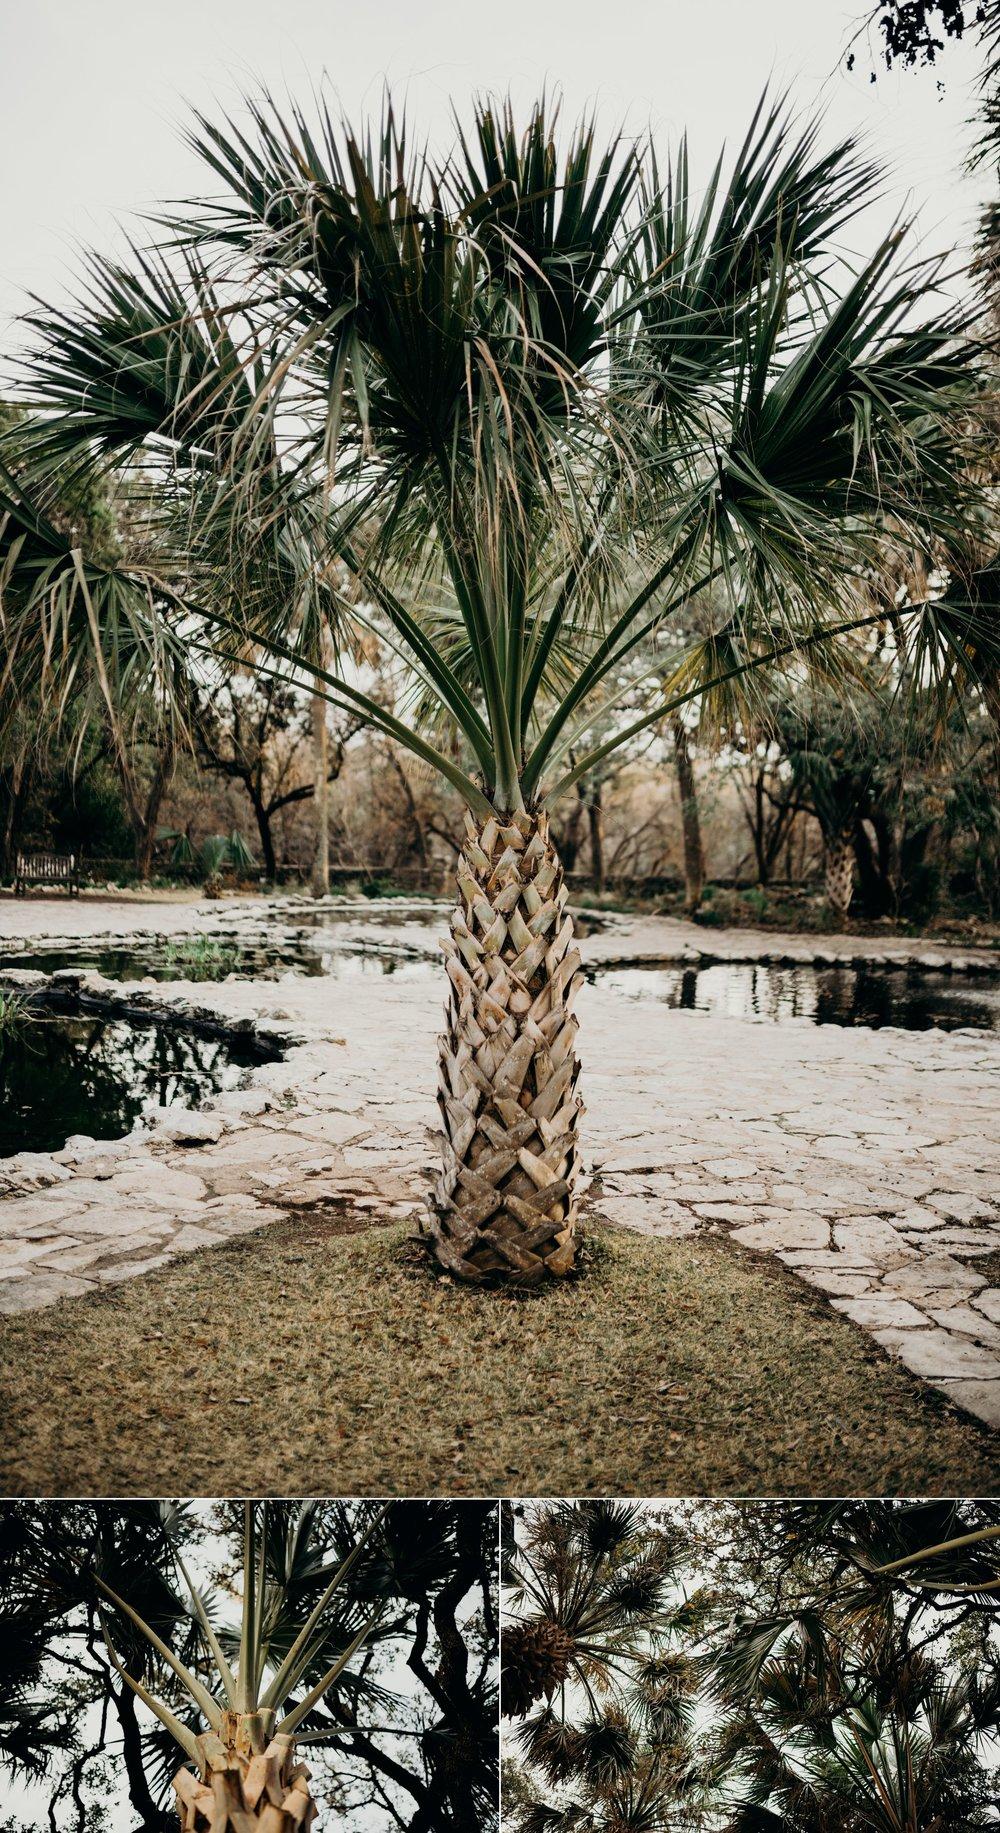 drew-andrew-texas-austin-minnesota-minneapolis-wedding-photographer-destination-elopement-intimate-adventurous_0135.jpg